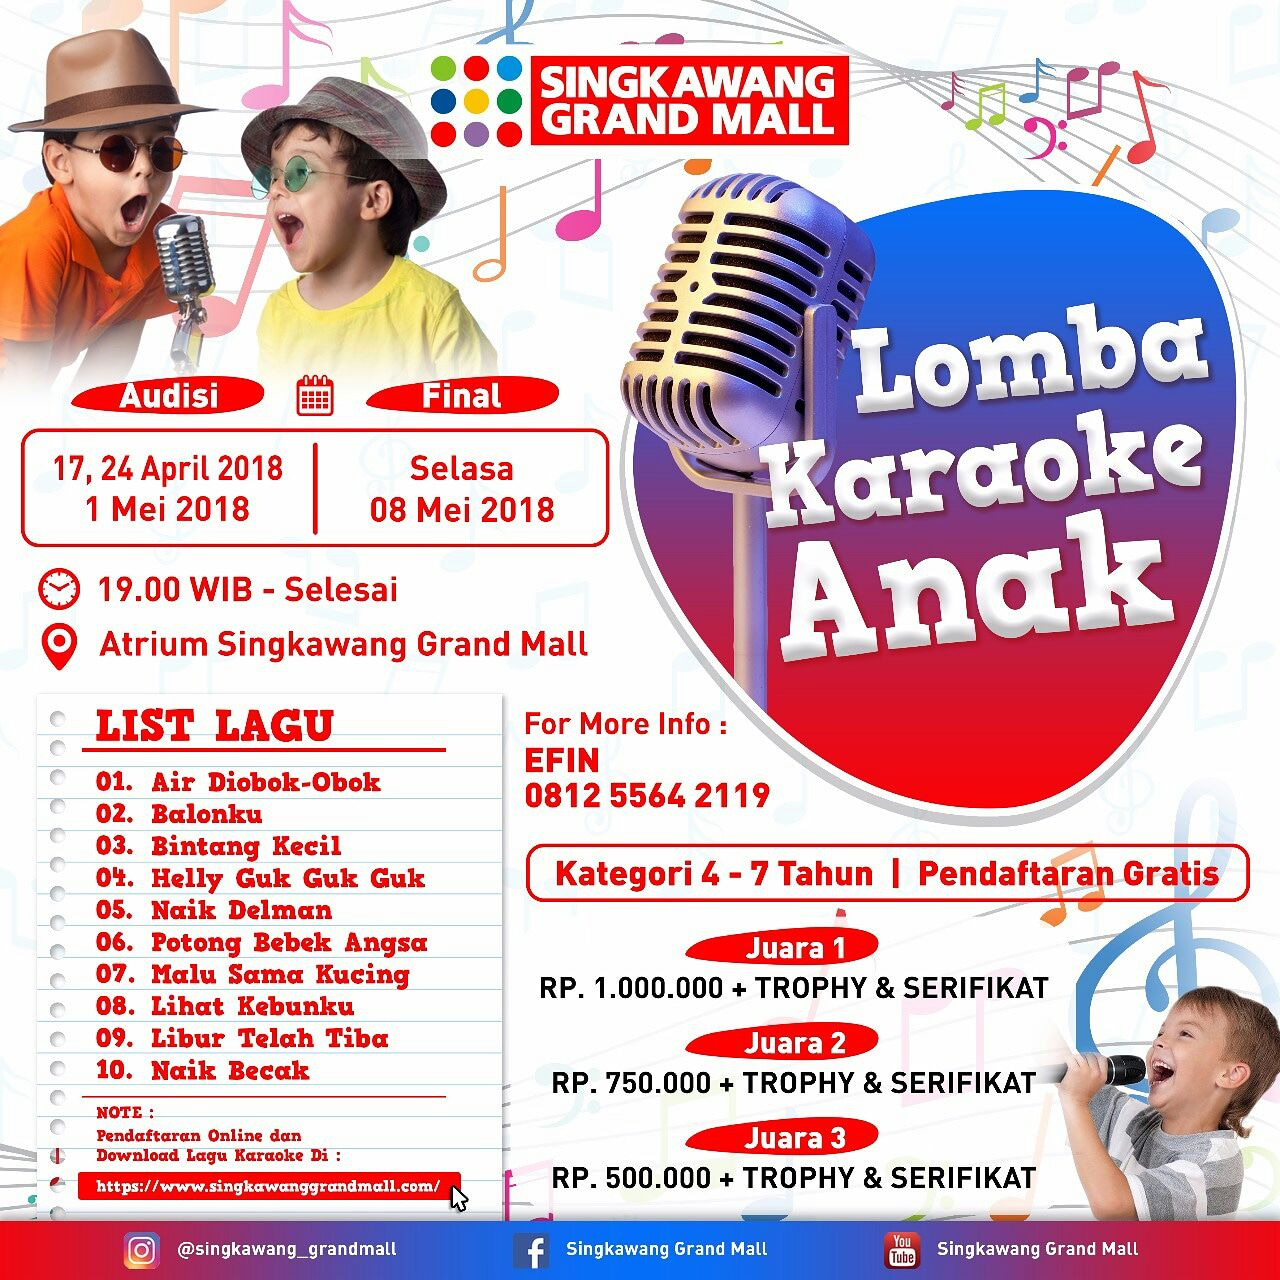 Lomba Karaoke Anak Singkawang Grand Mall